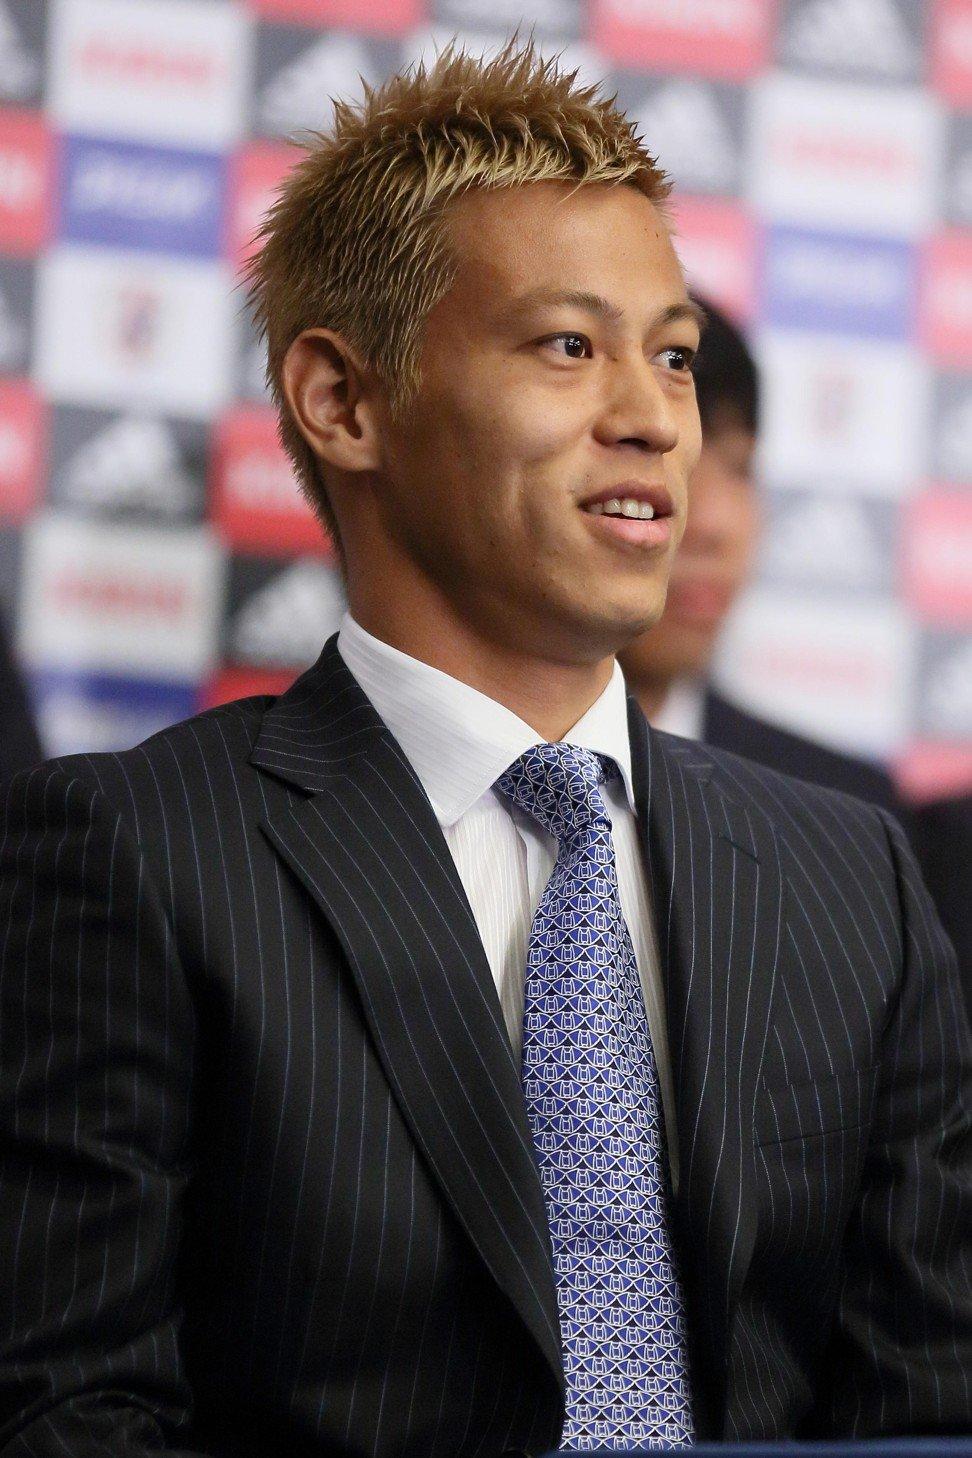 530b849e Five most stylish World Cup soccer stars: Neymar and Ronaldo score on the  fashion front | South China Morning Post